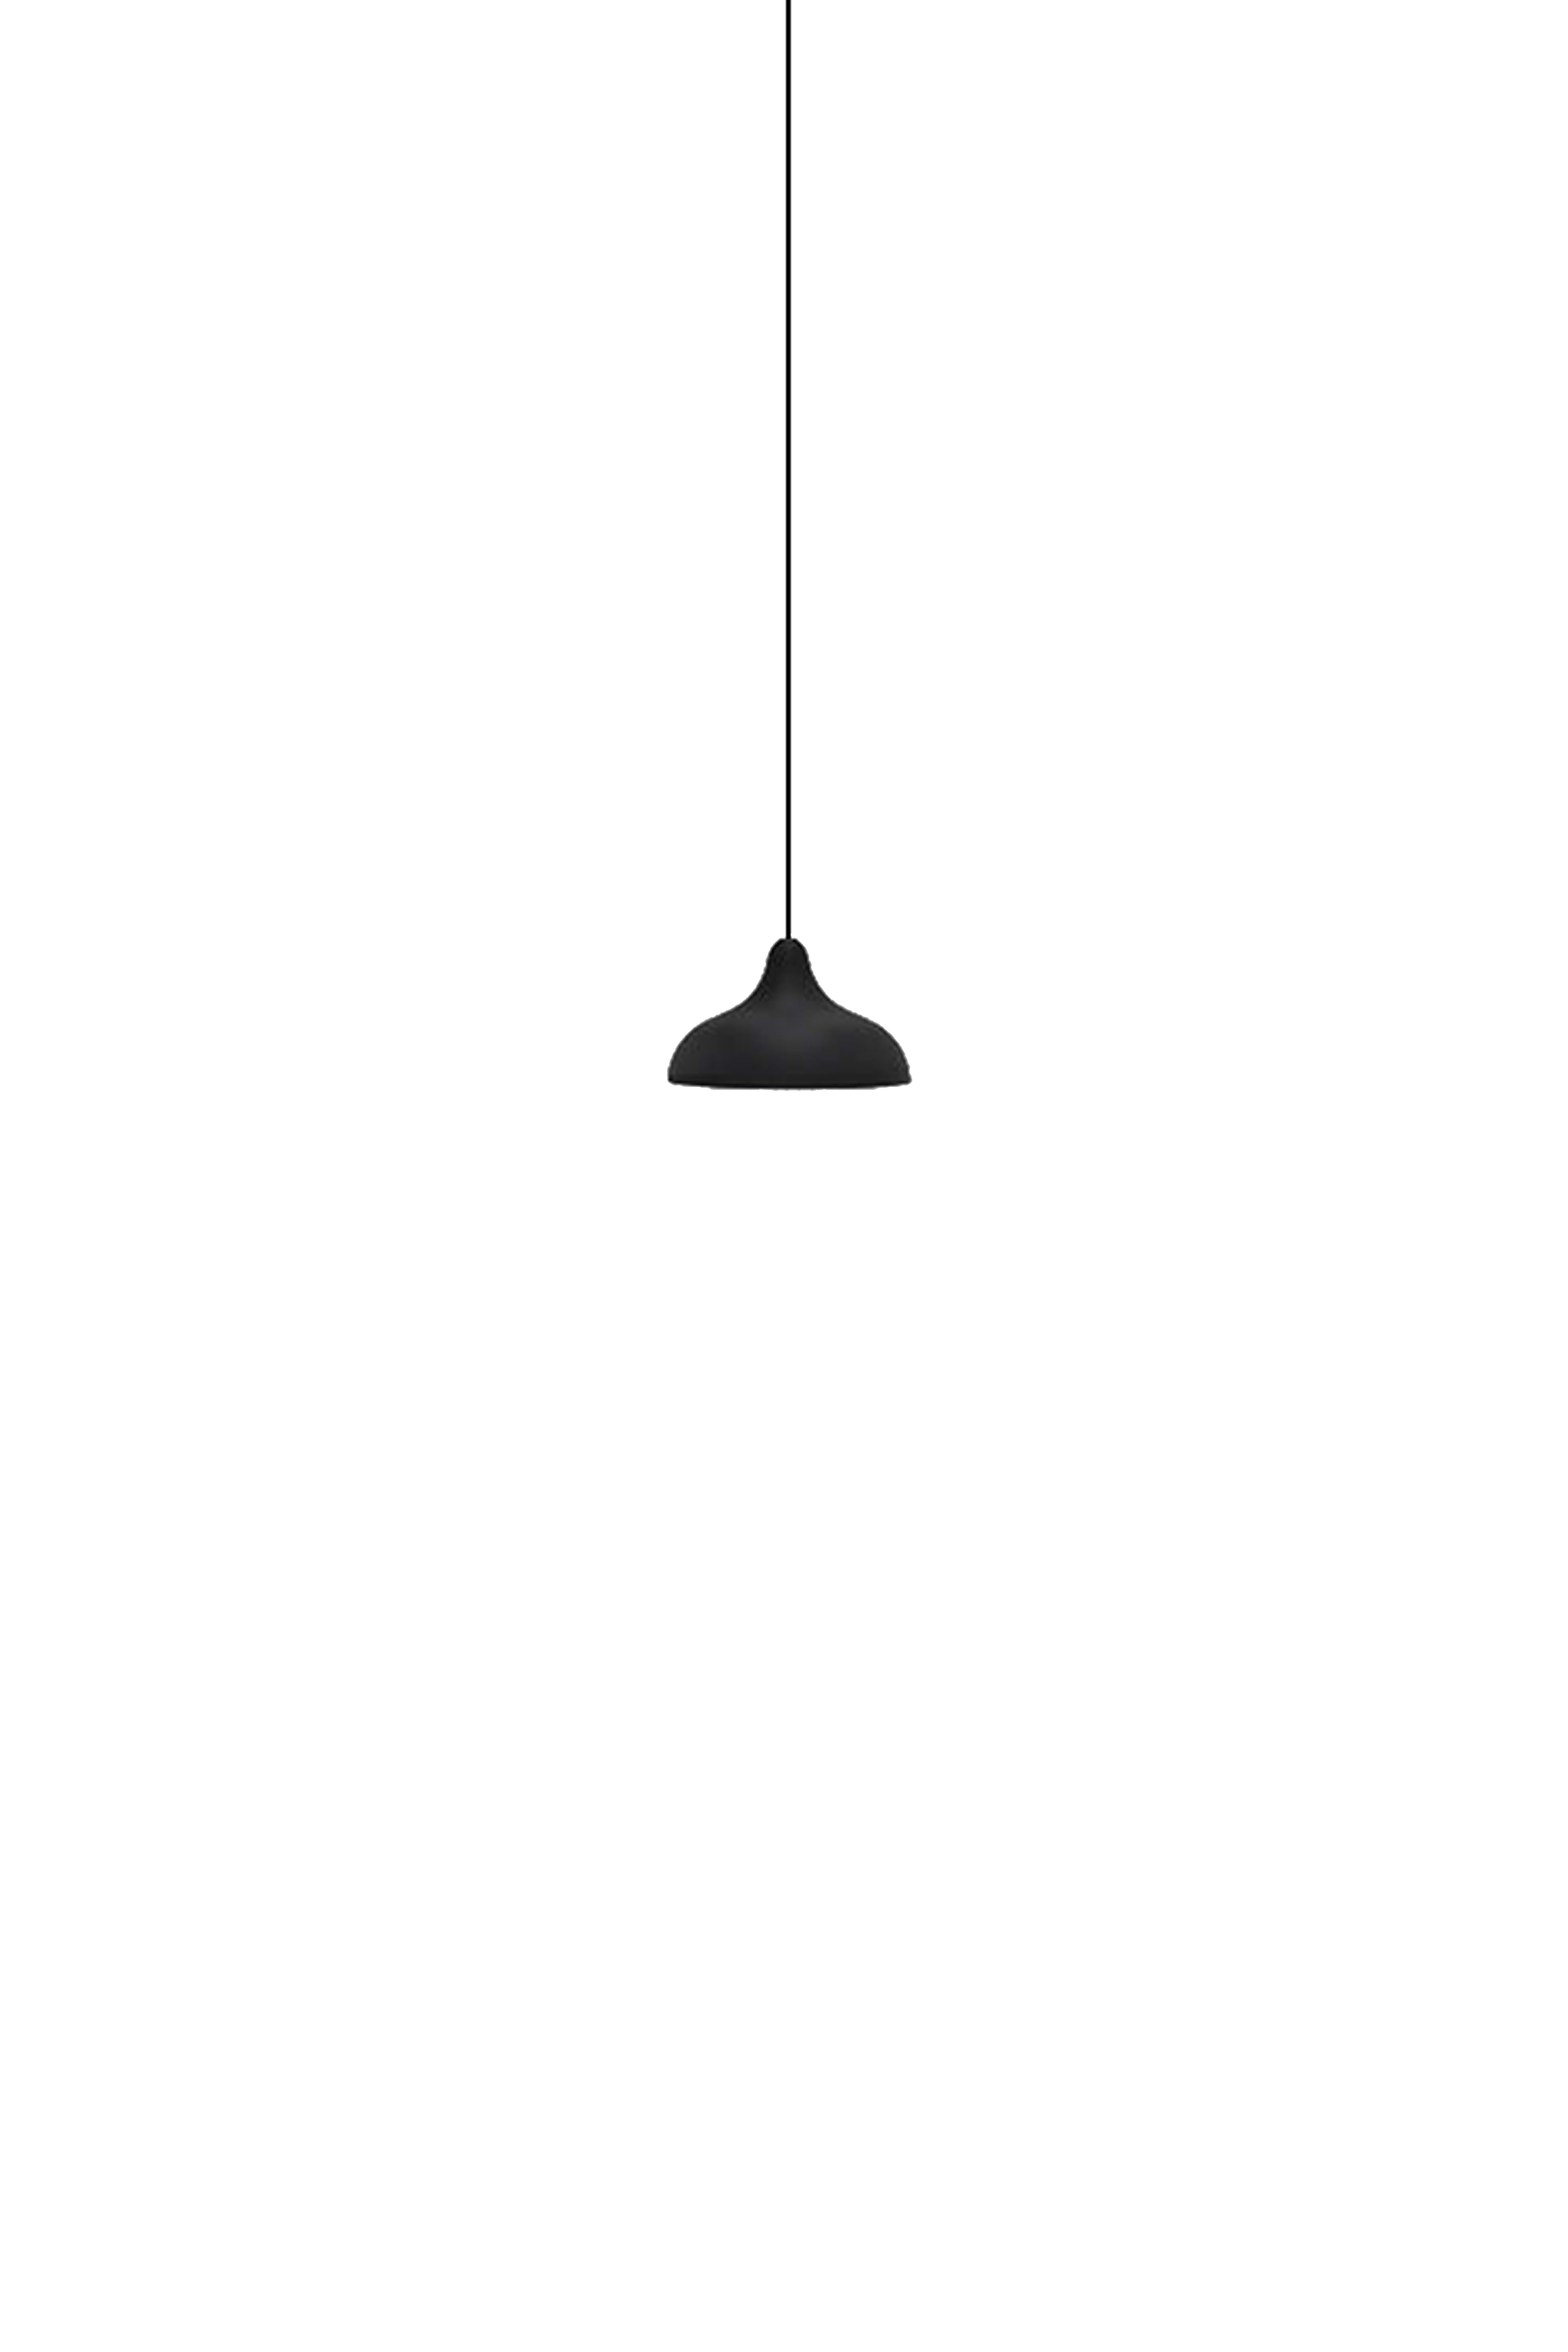 POPPER FLAT / SMALL HANG